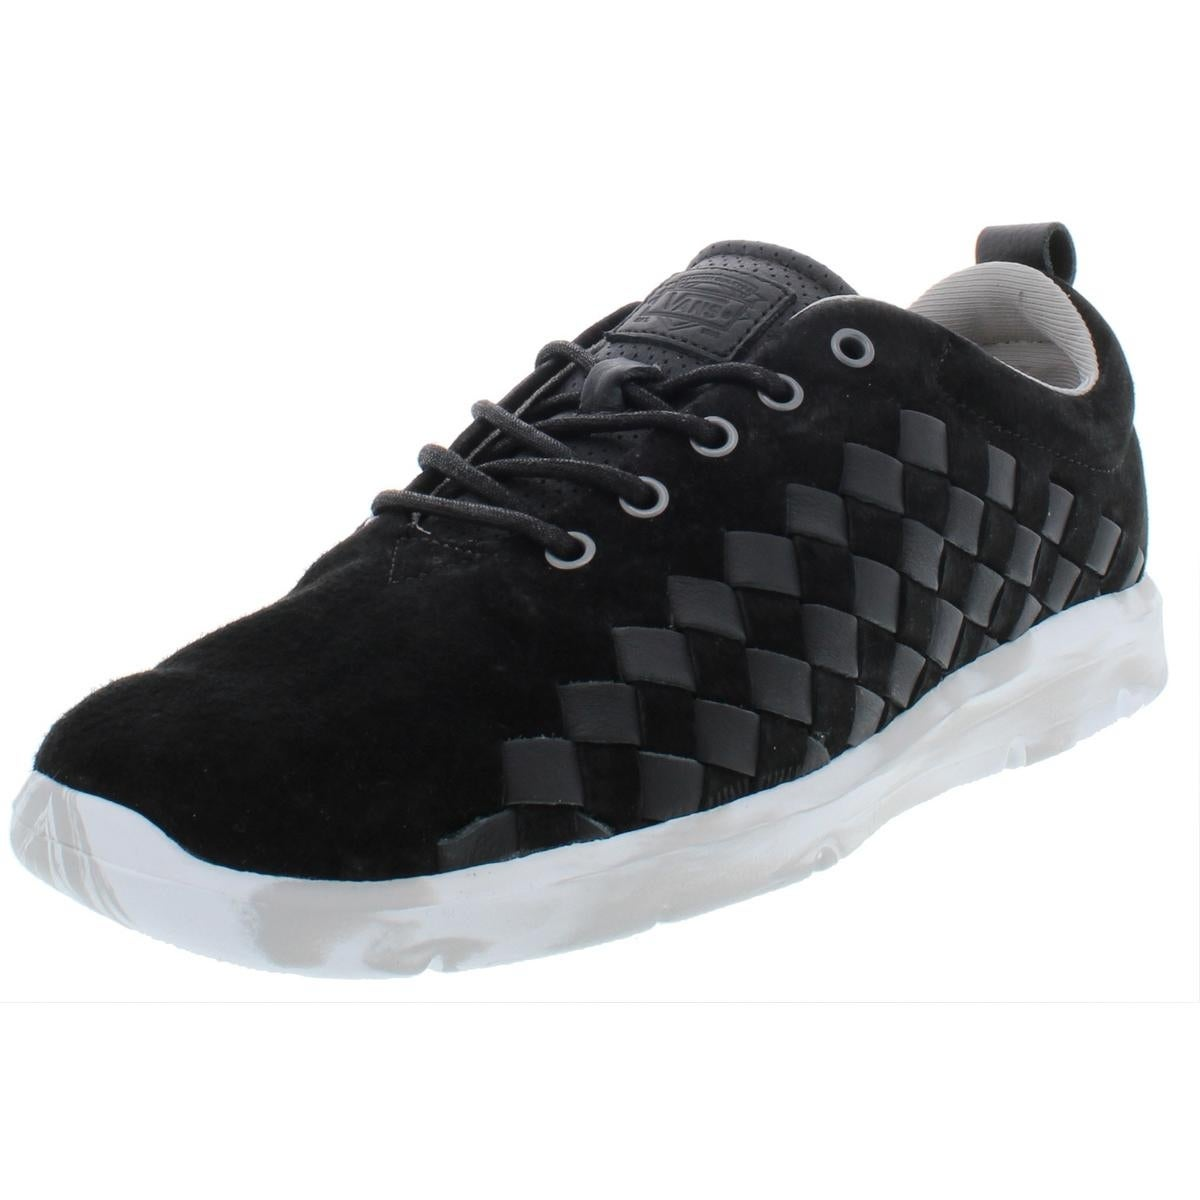 Vans Mens Tesella Plus Suede Low Top Casual Shoes